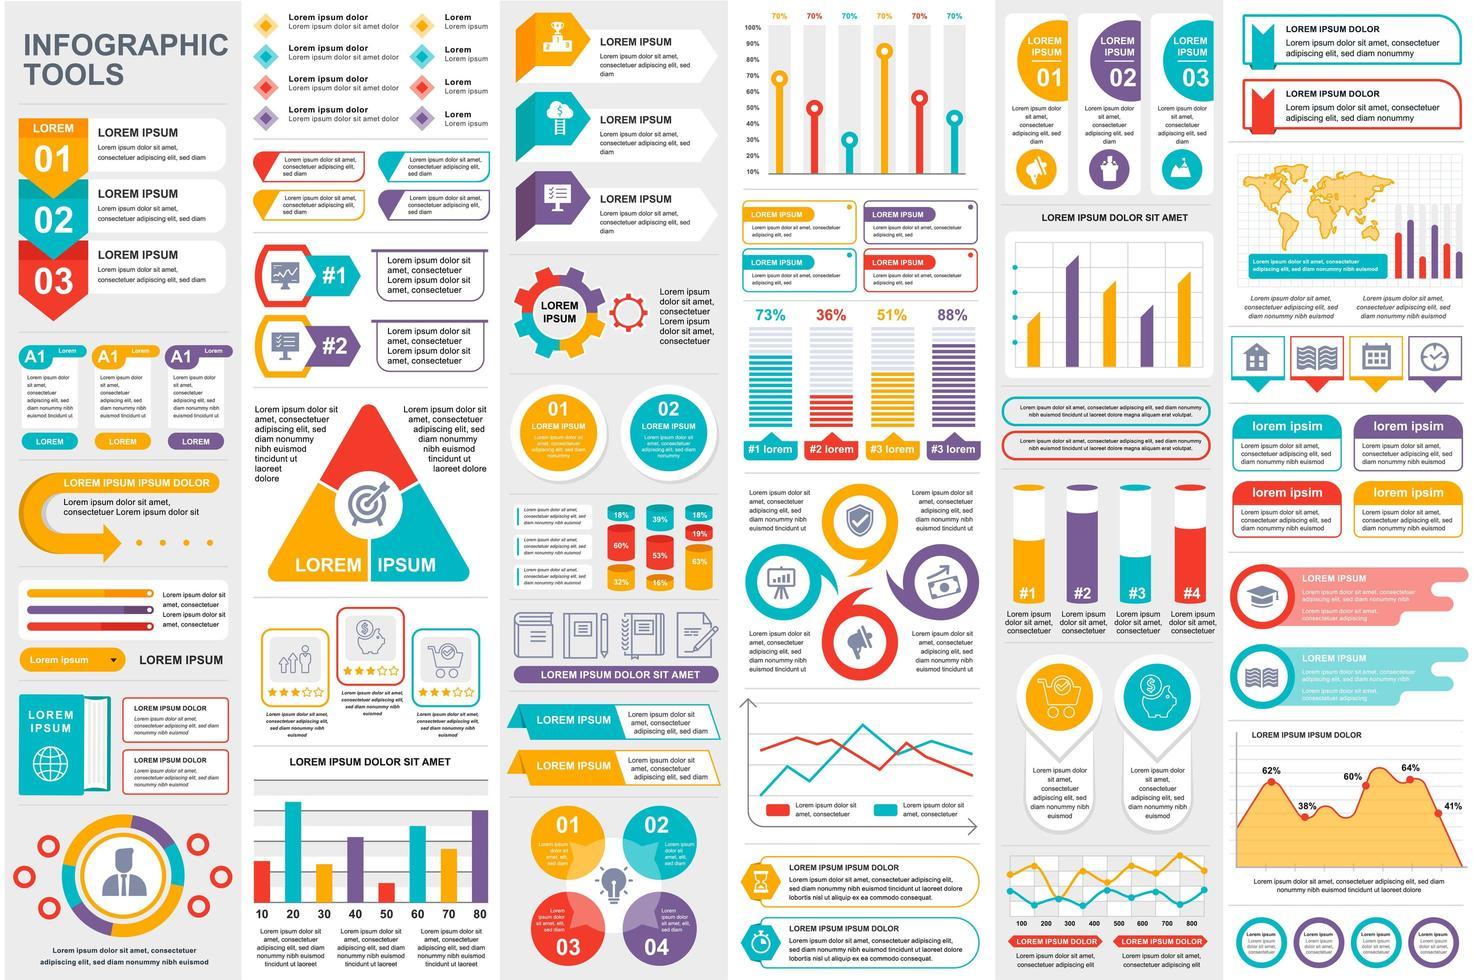 färgglada infografiska element datavisualiseringspaket vektor